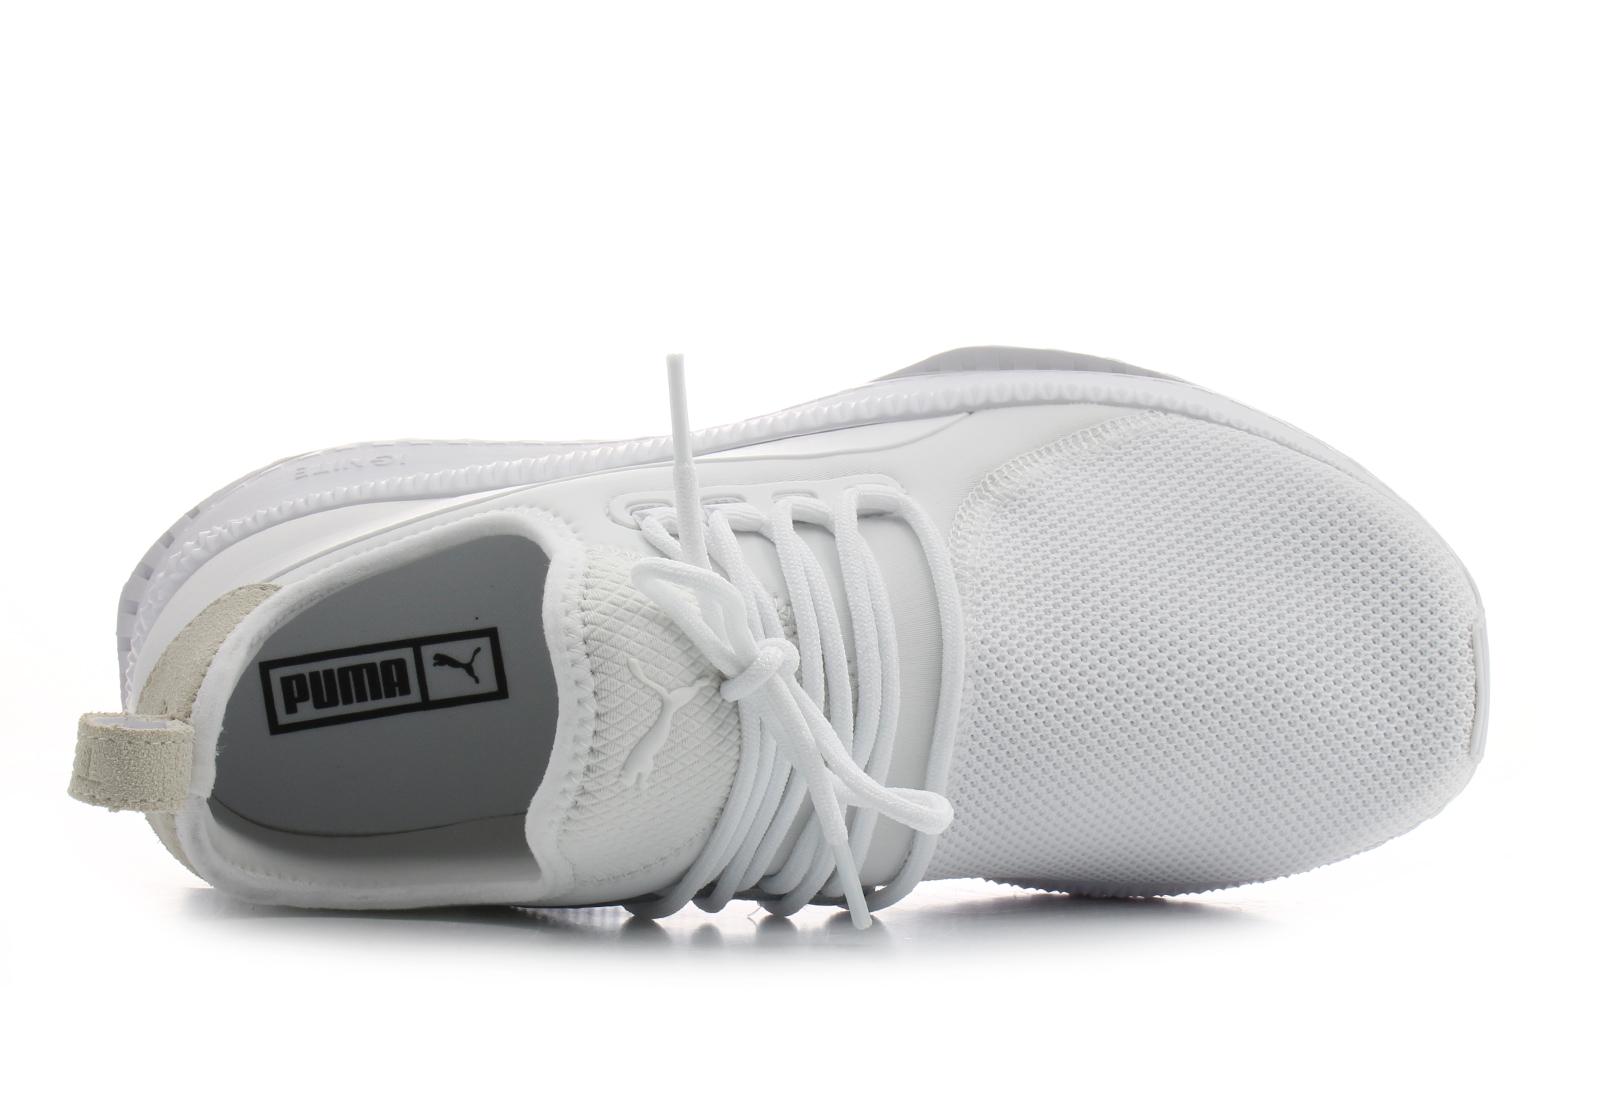 Puma Cipő - Tsugi Apex - 36609002-wht - Office Shoes Magyarország c522256f0f